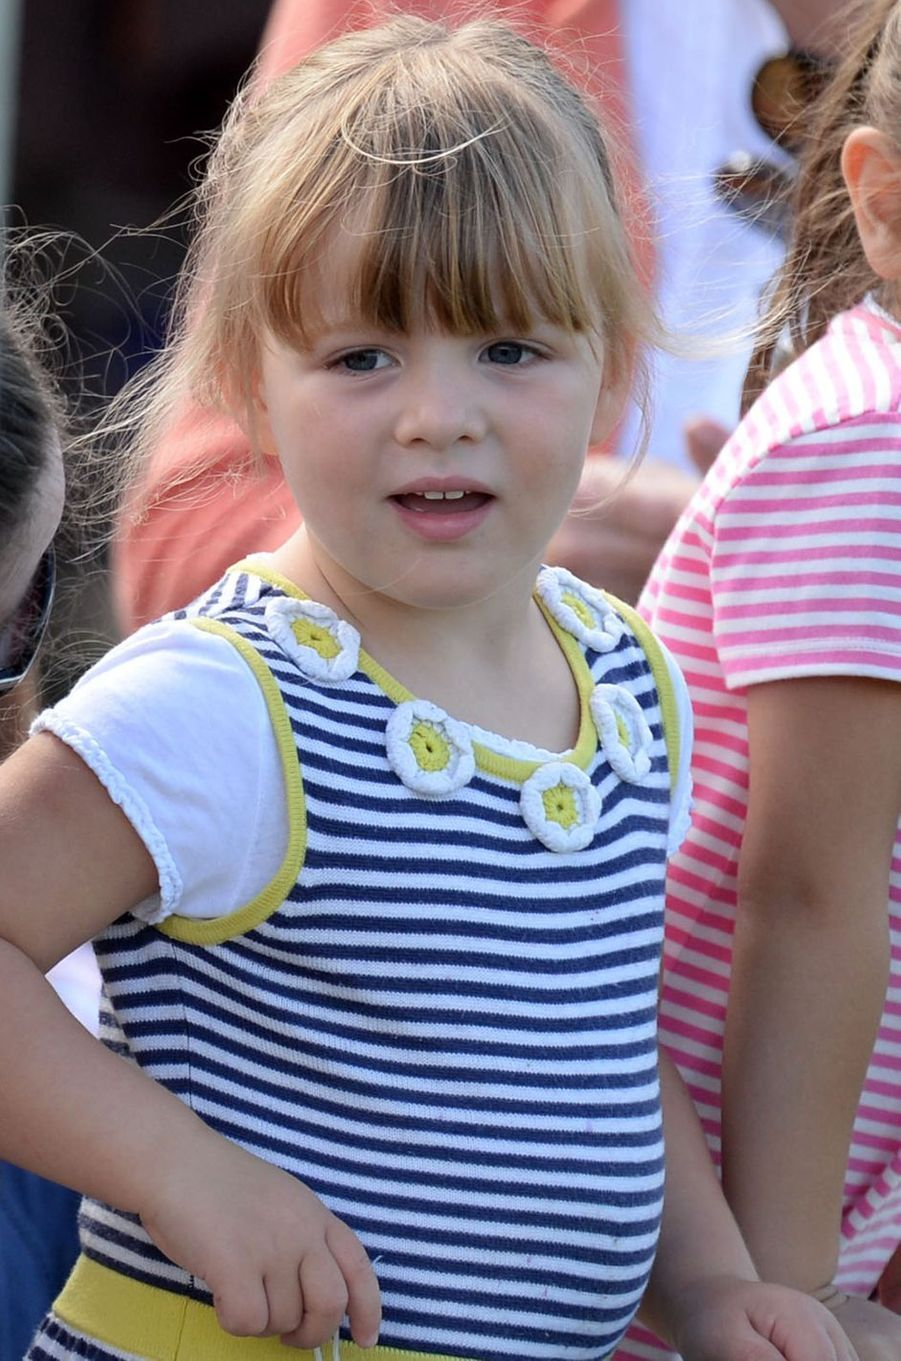 Mia Tindall à Gatcombe Park, le 5 août 2017